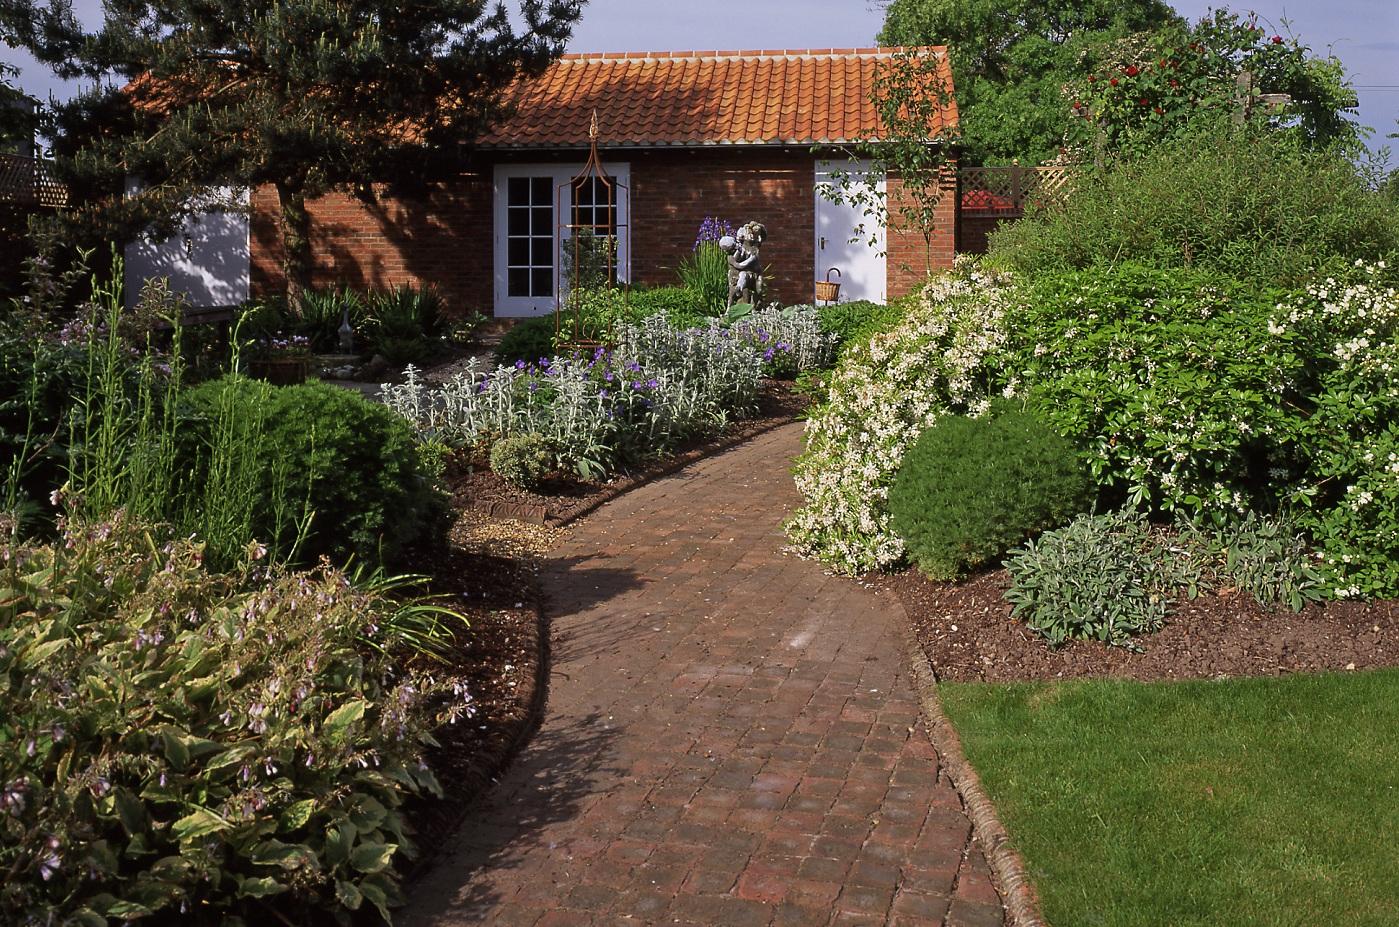 Cobbles | landscape | garden | York Handmade Bricks